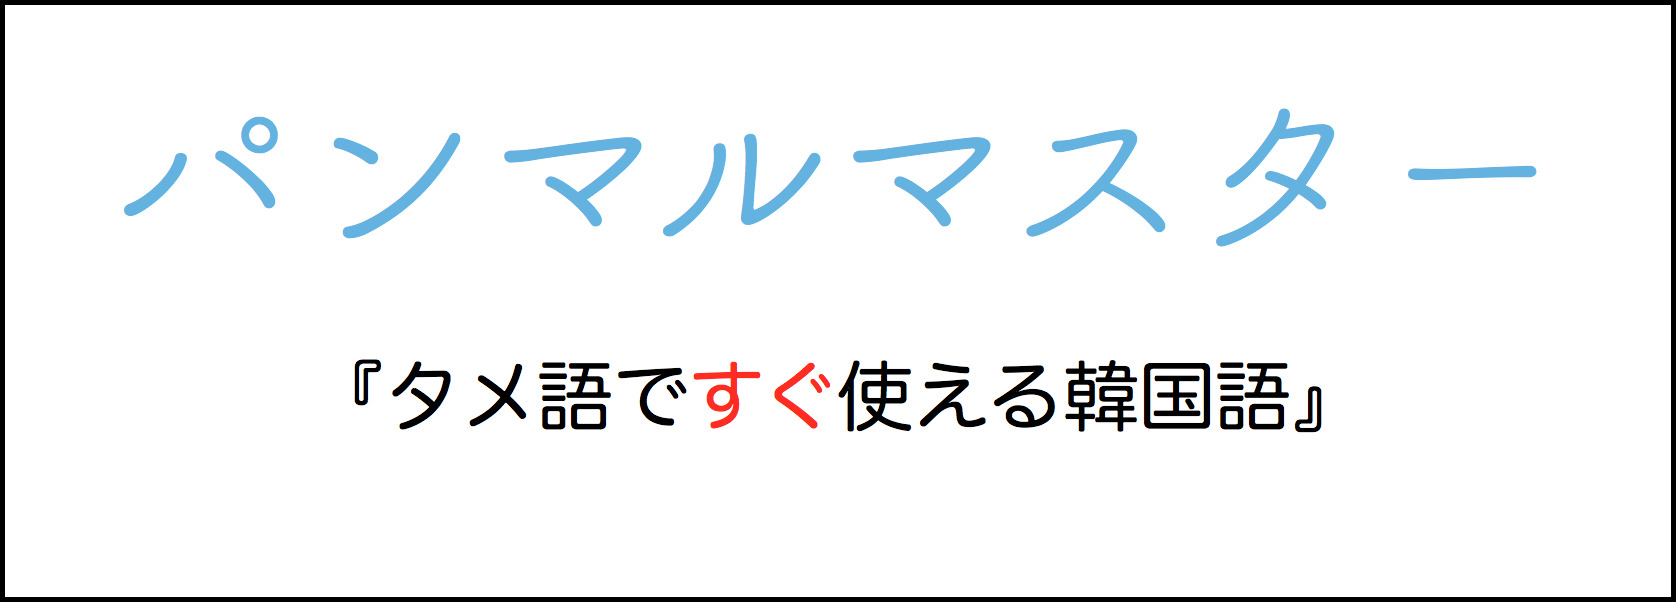 panmalmaster-logo